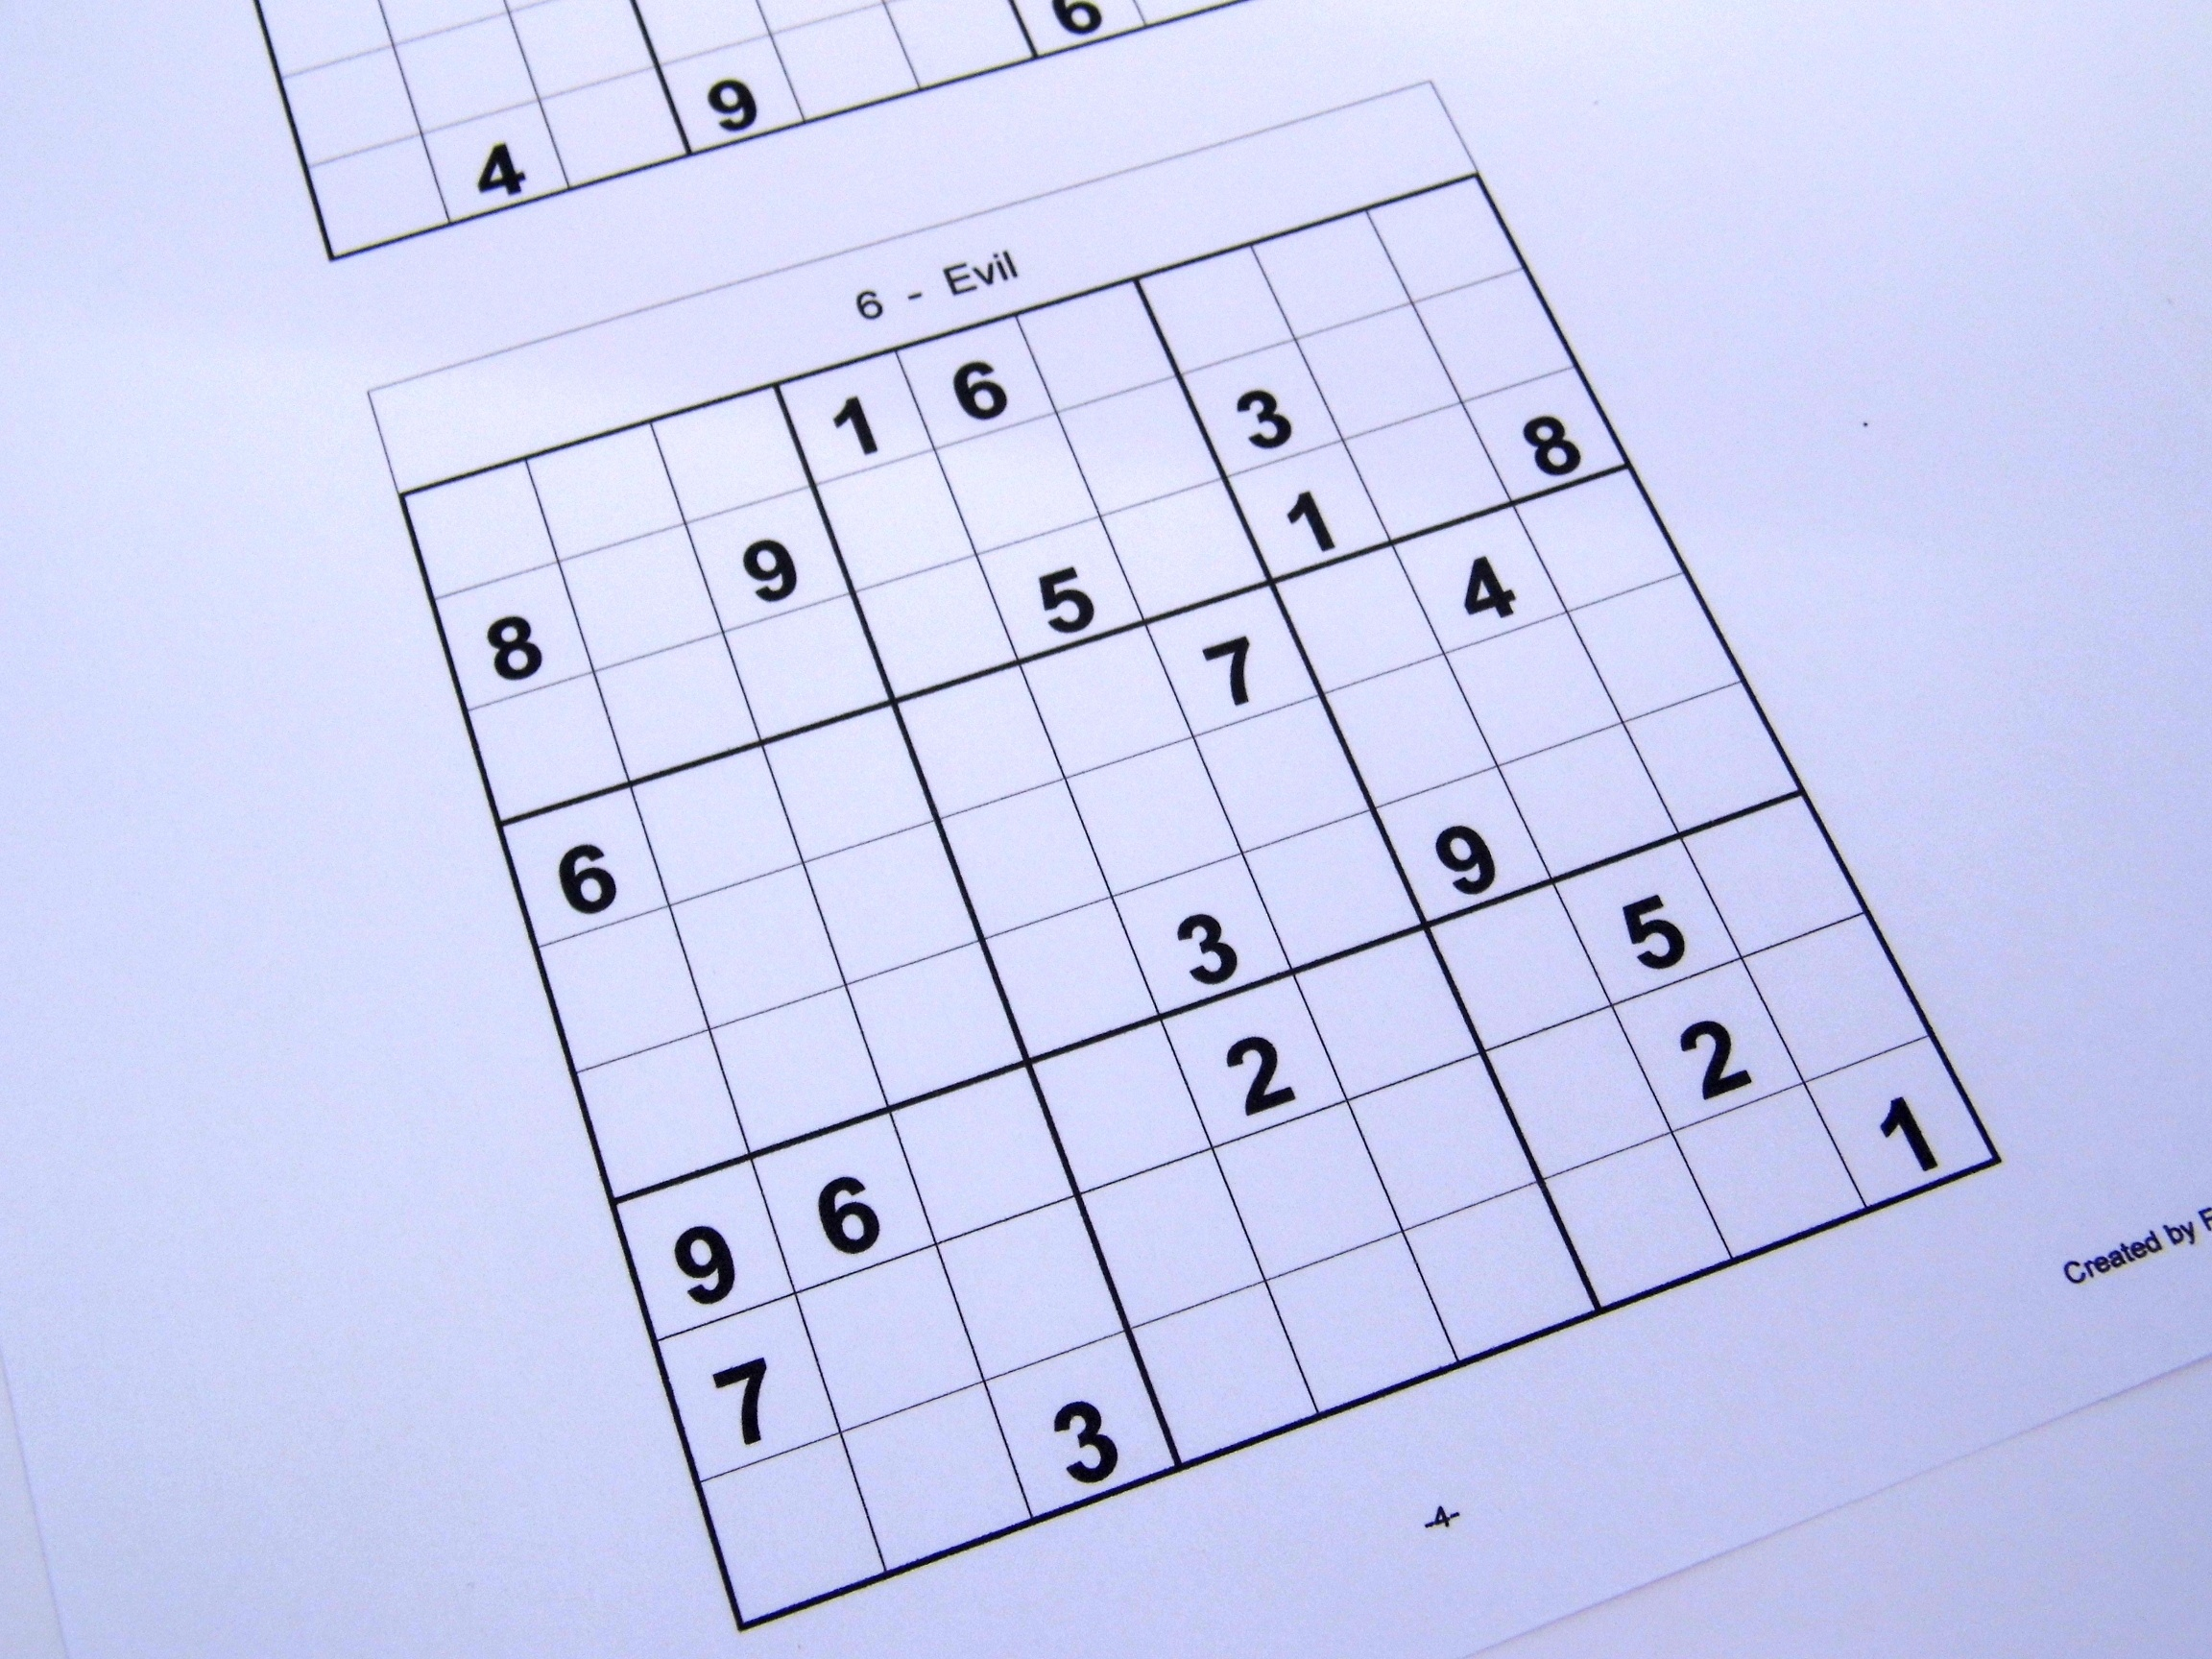 Hard Printable Sudoku Puzzles 6 Per Page – Book 1 – Free Sudoku Puzzles - Free Printable Sudoku Books